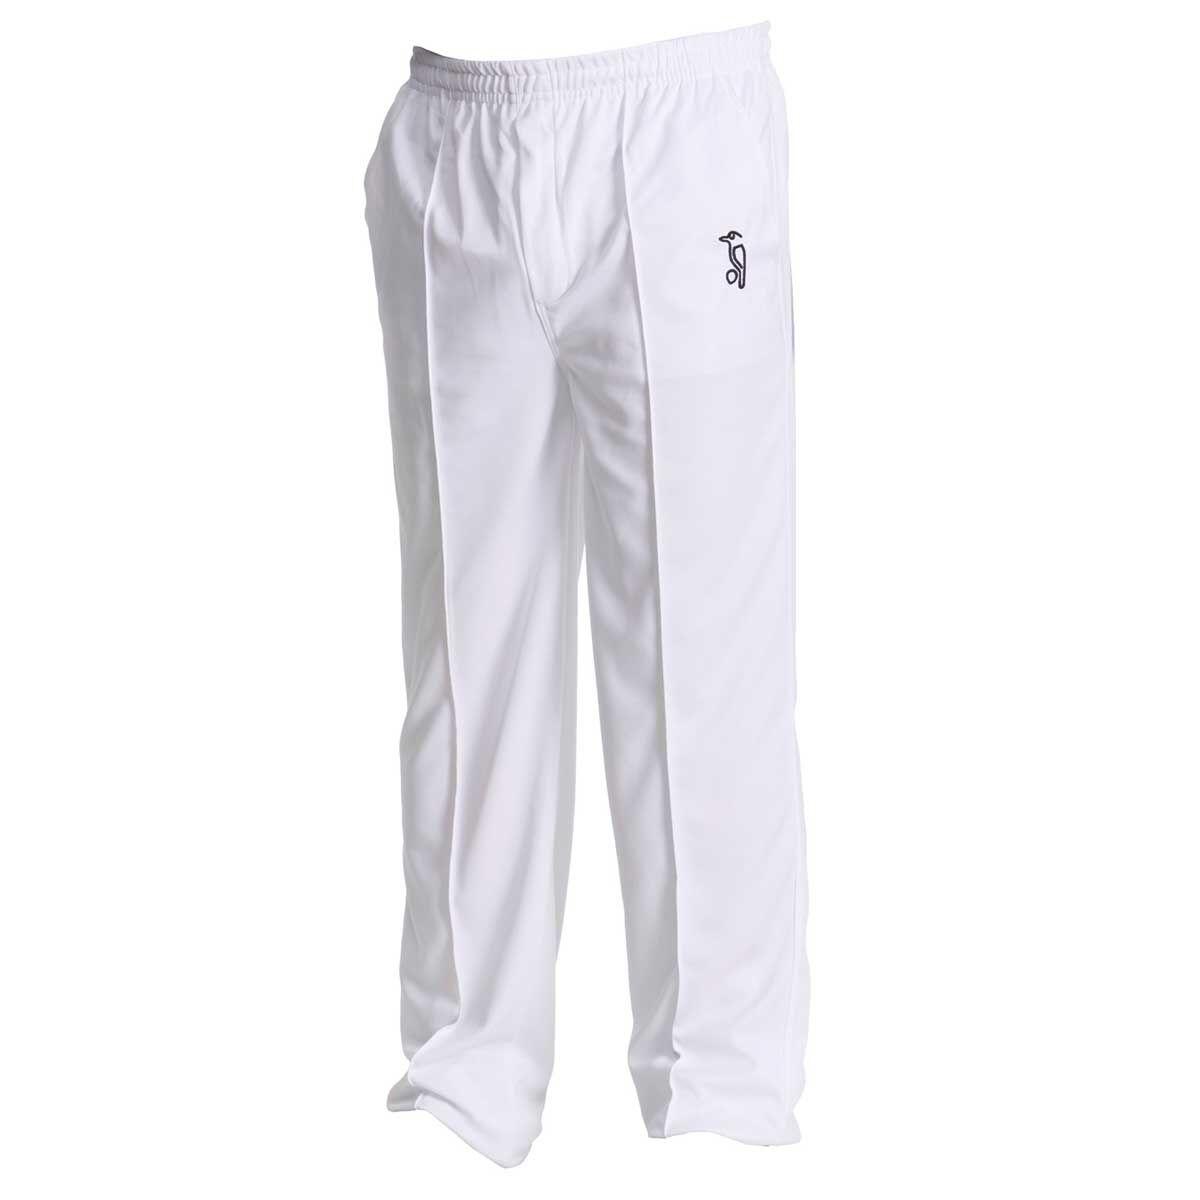 Kookaburra Active Senior Cricket Pants White XXL | Rebel Sport